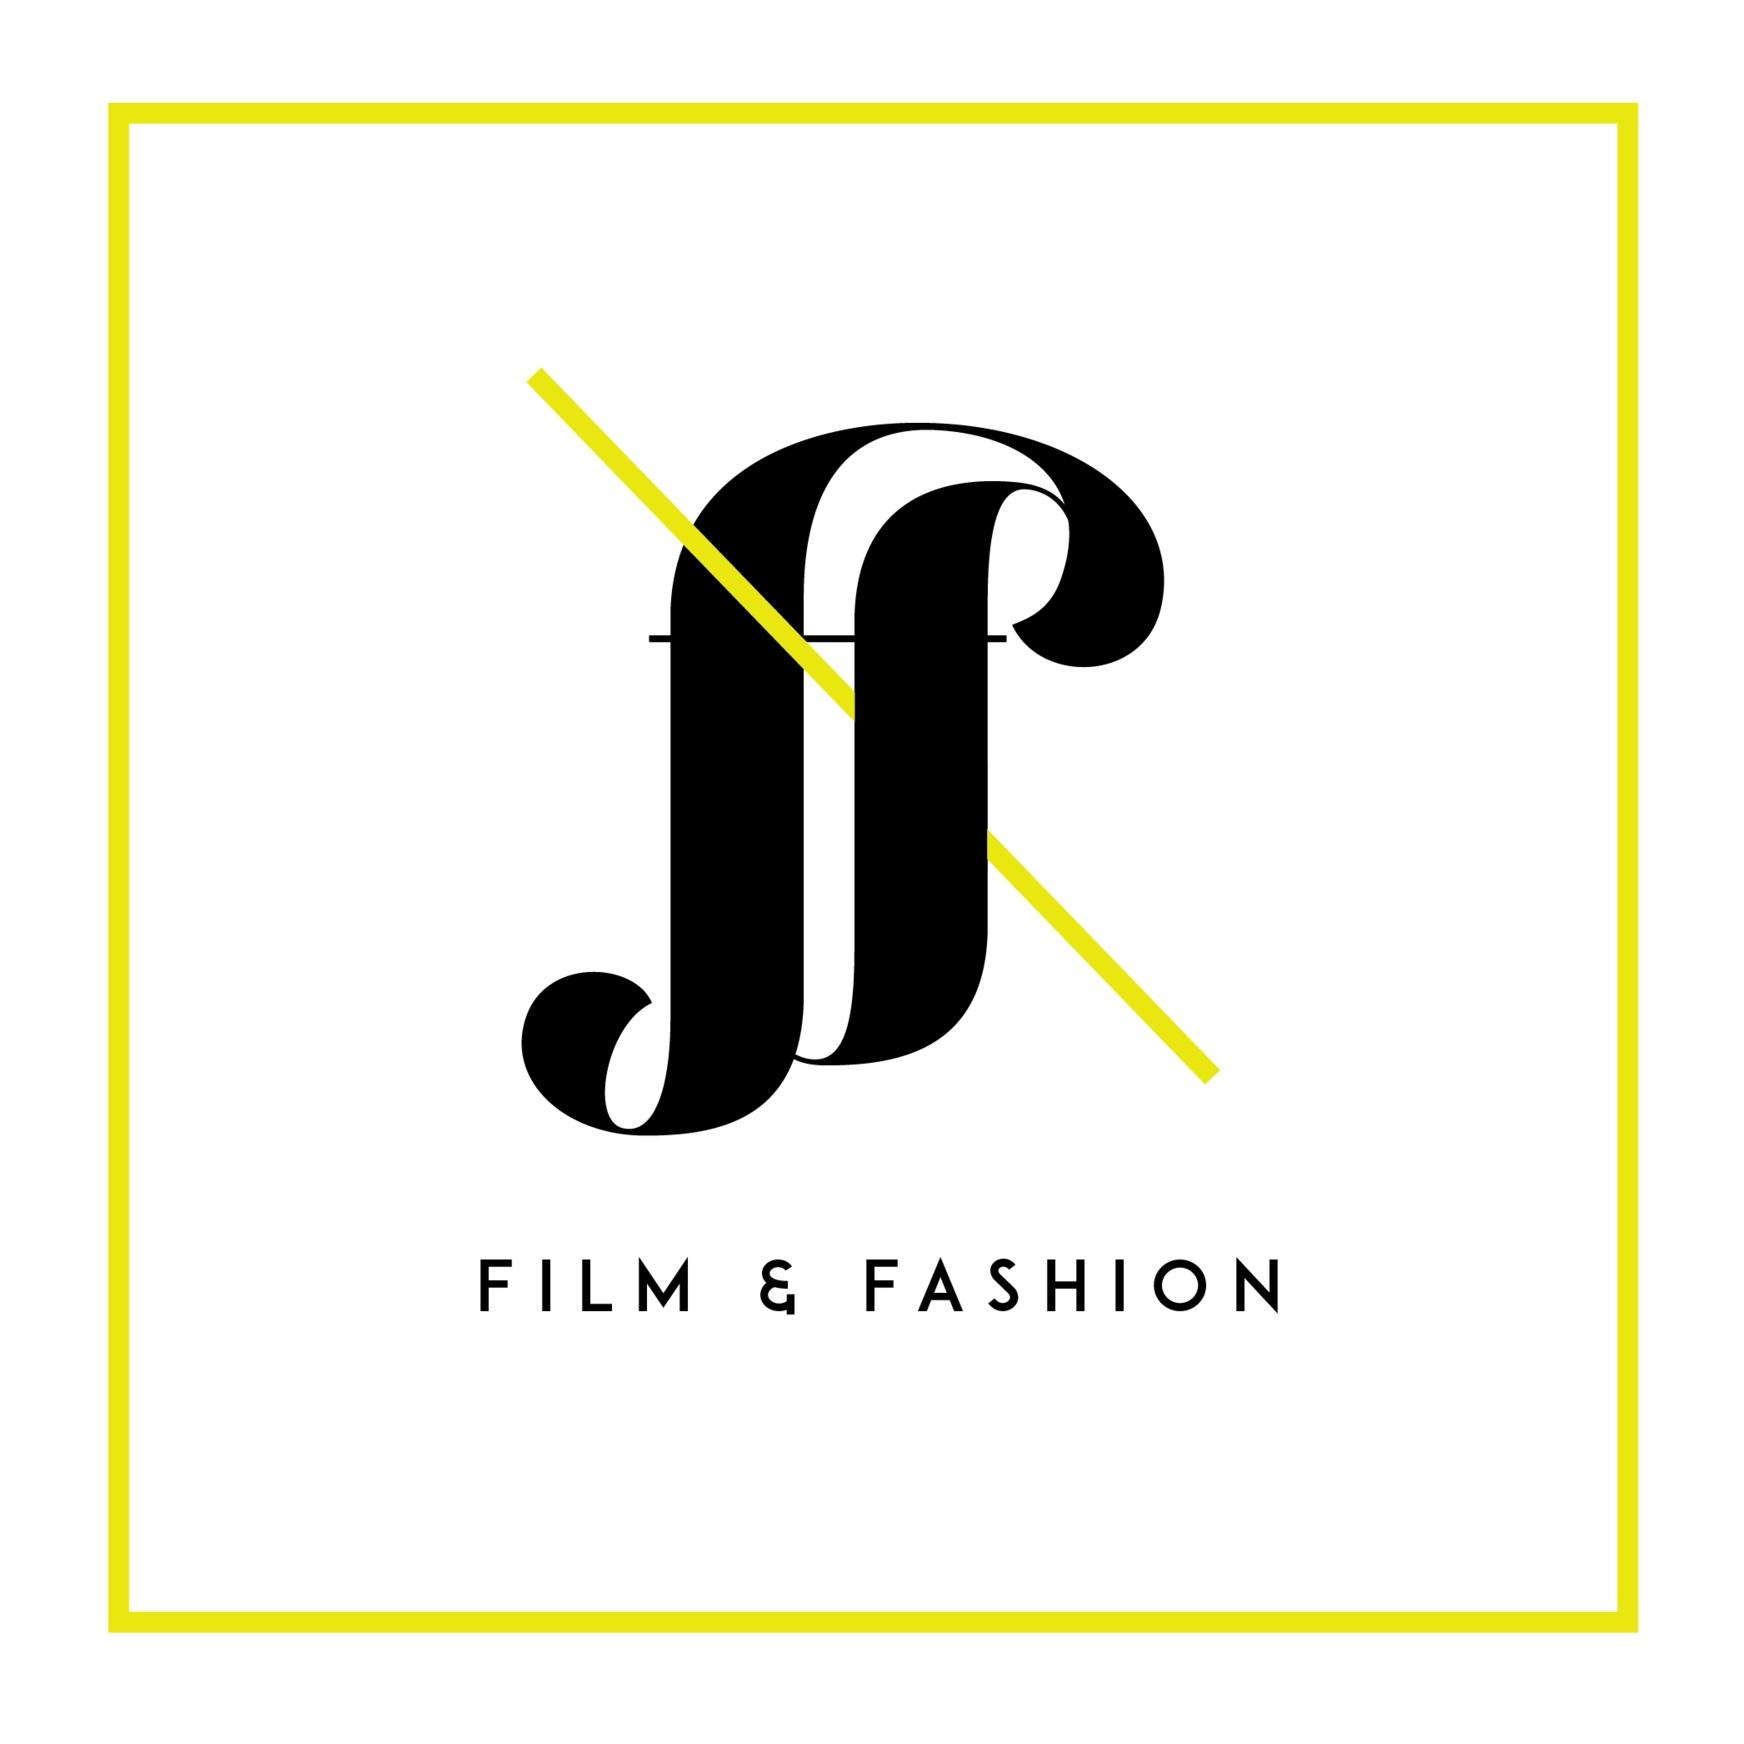 SD+logo+yellow+square+-01.jpg